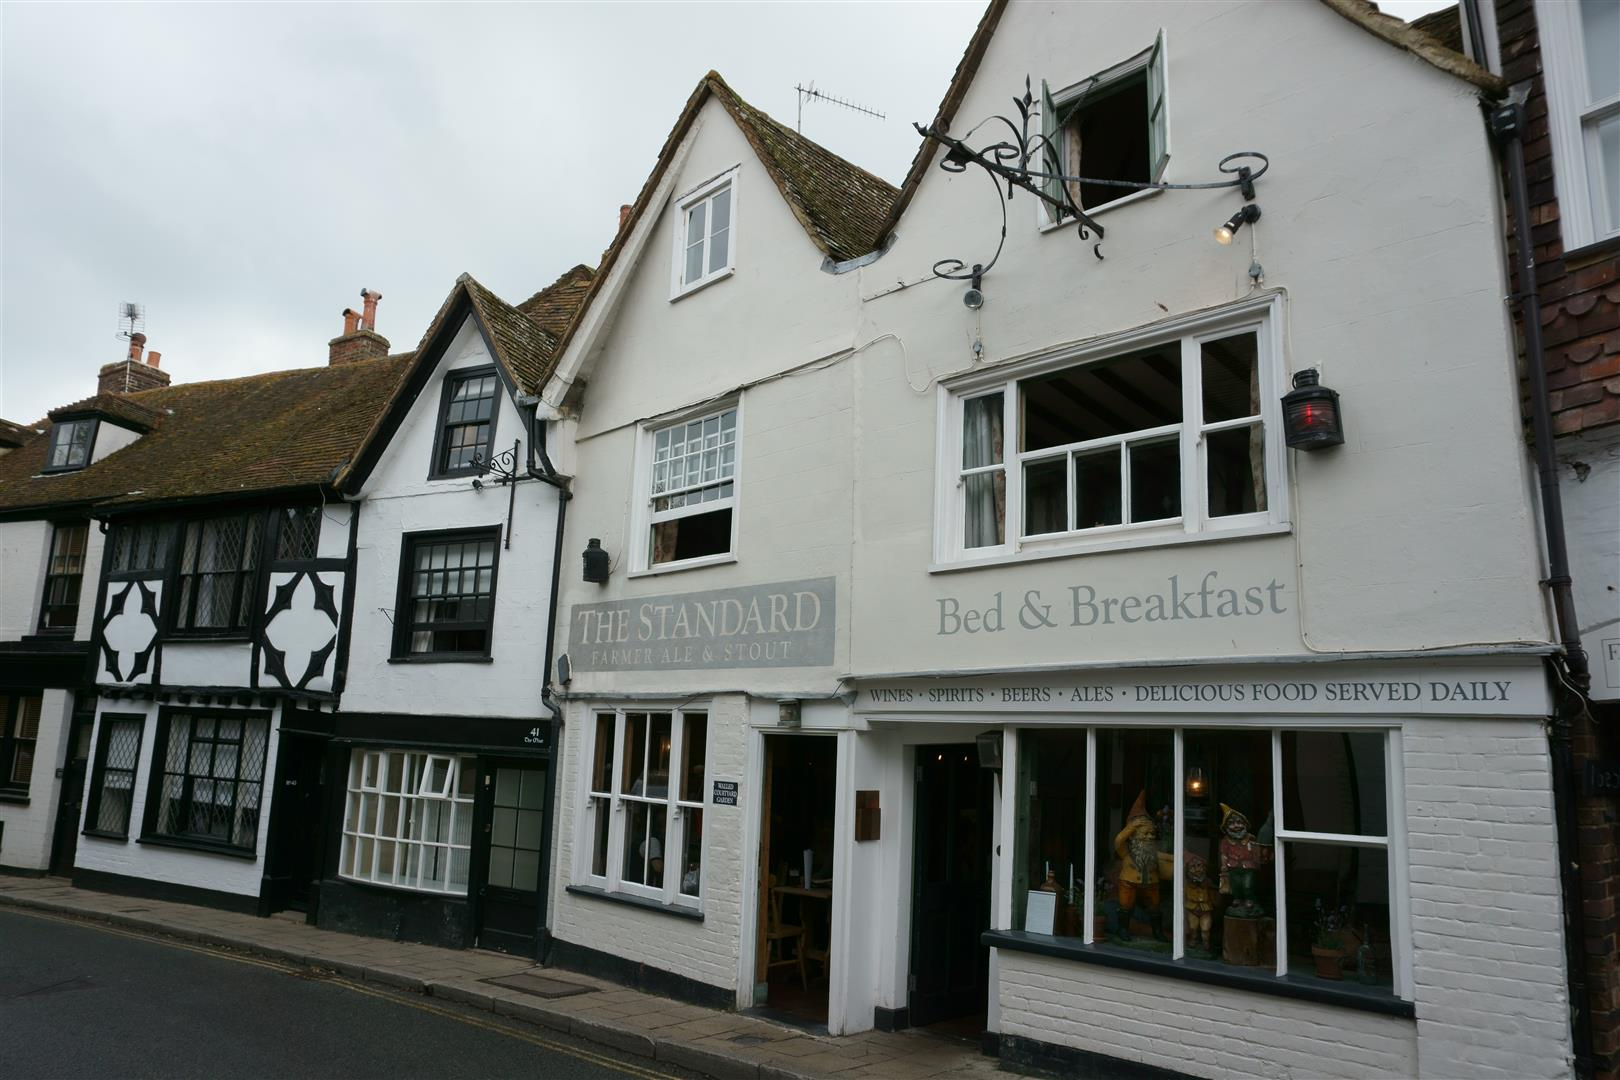 Rye - The Standard Pub